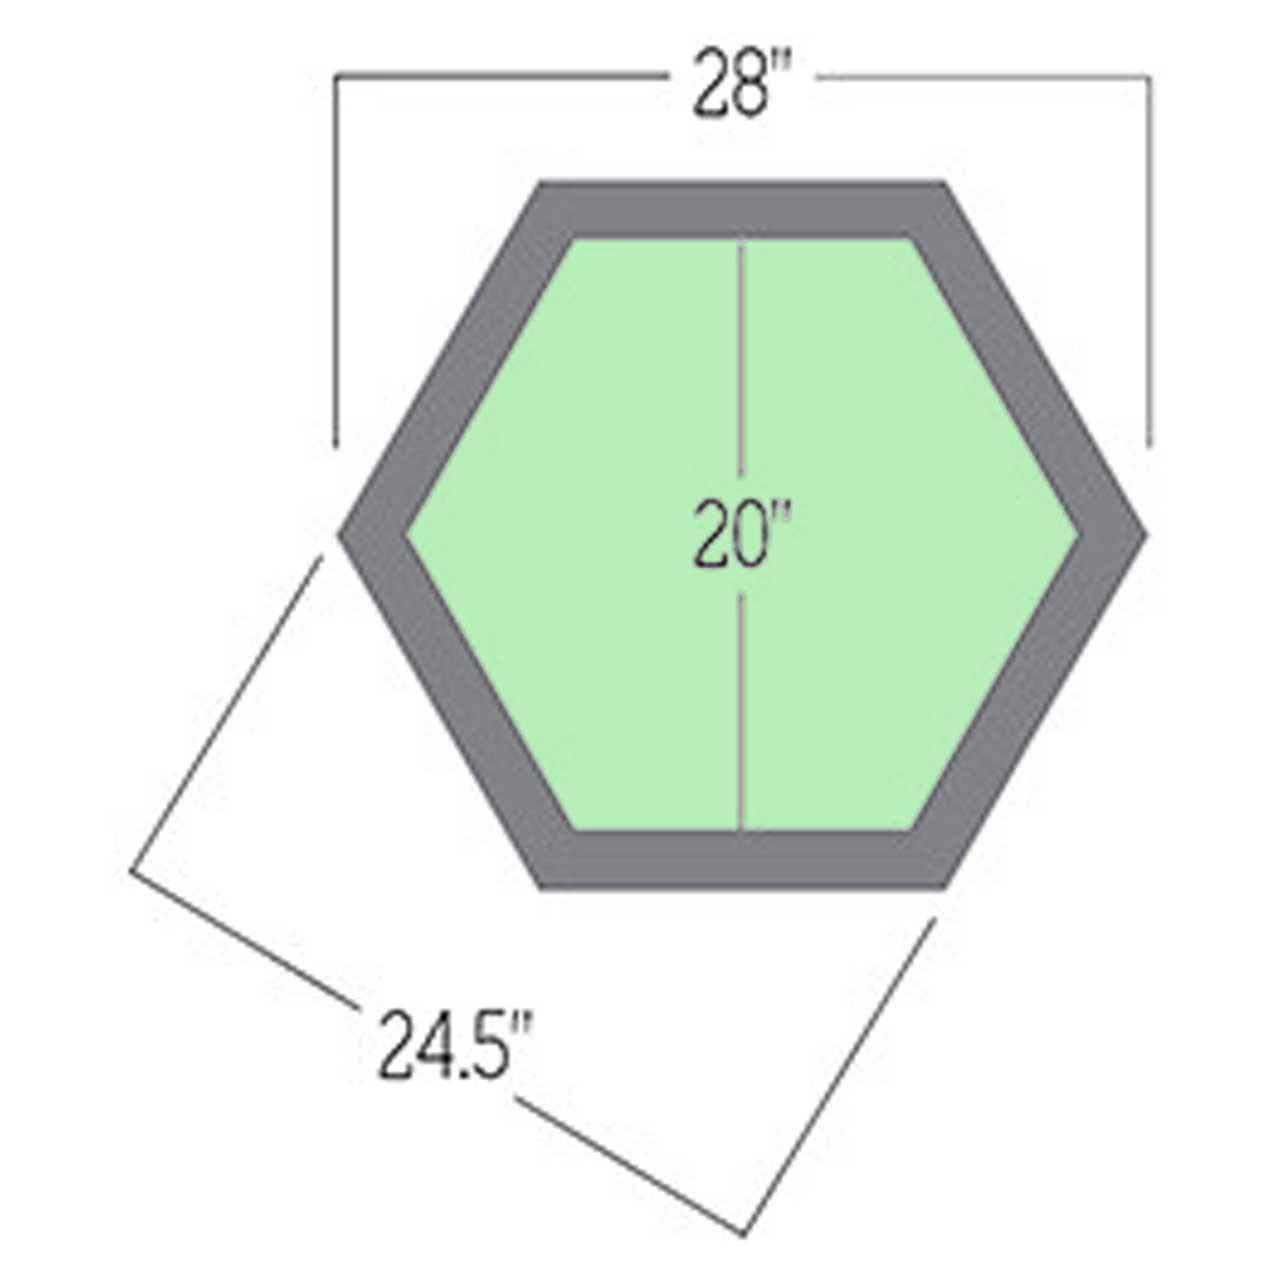 topaz-hex-planter dimensions